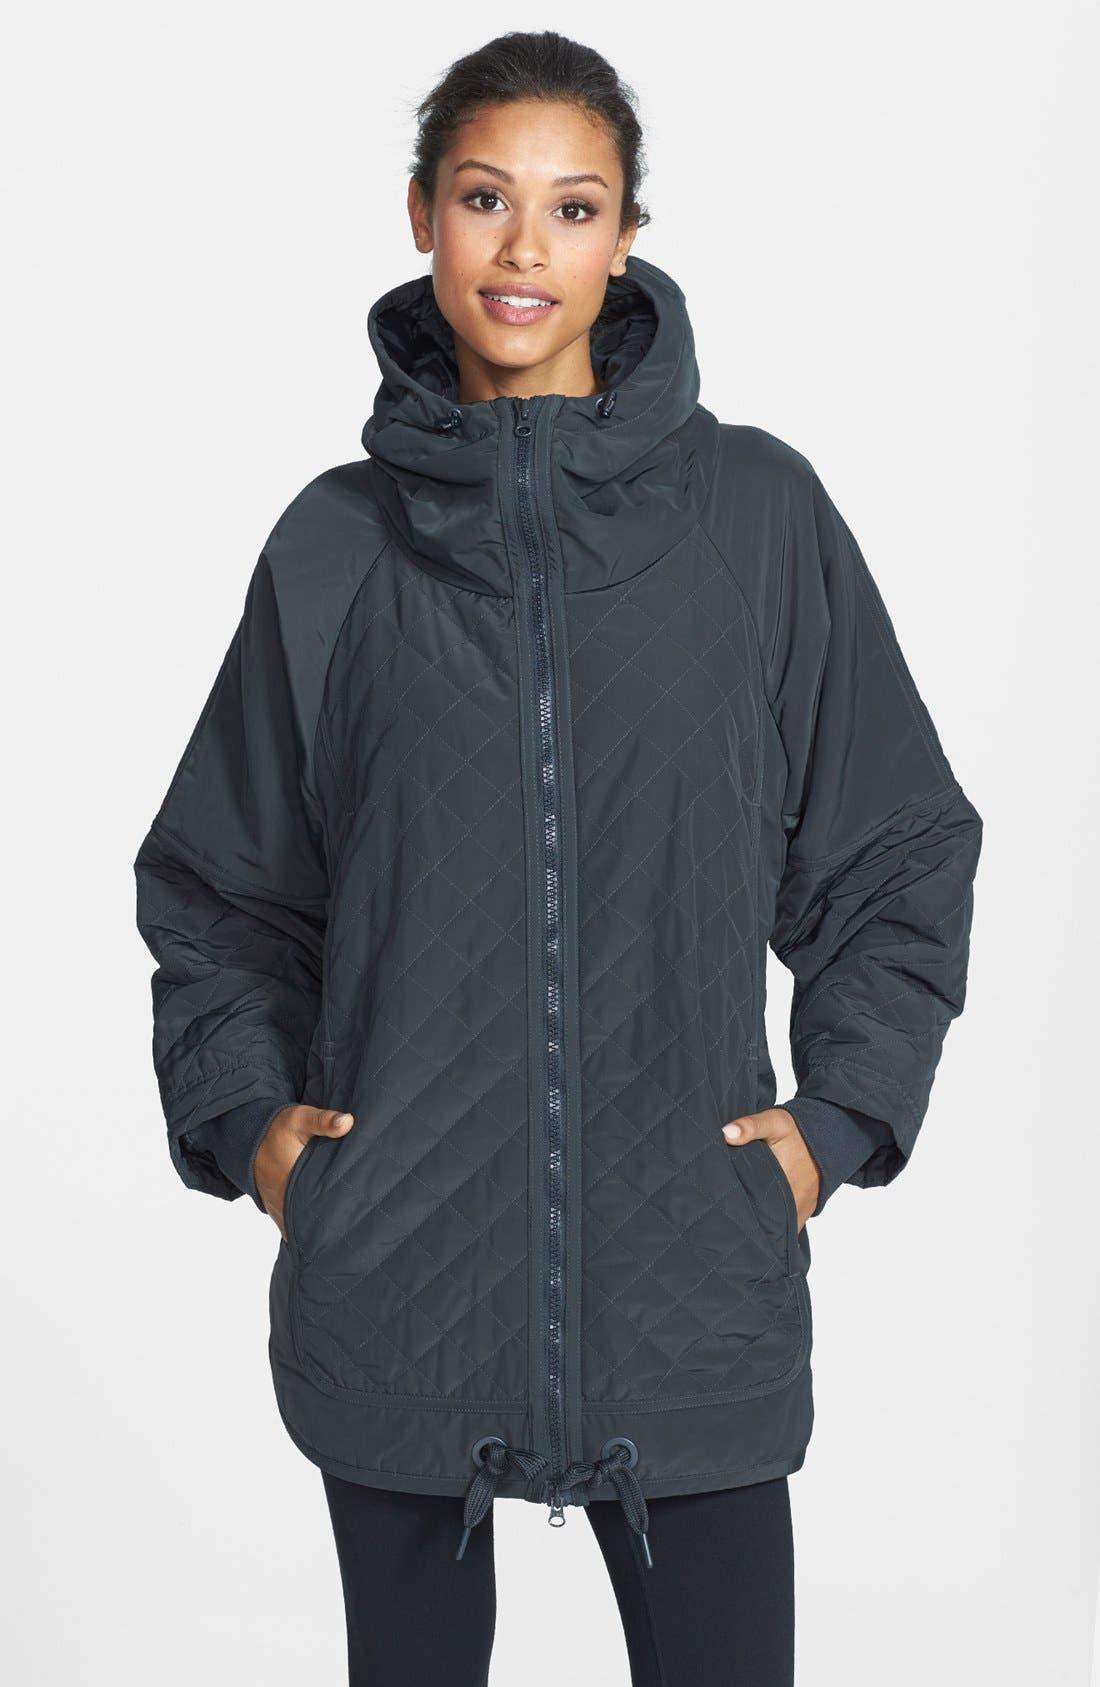 Main Image - adidas by Stella McCartney 'Wintersport' Hooded Jacket